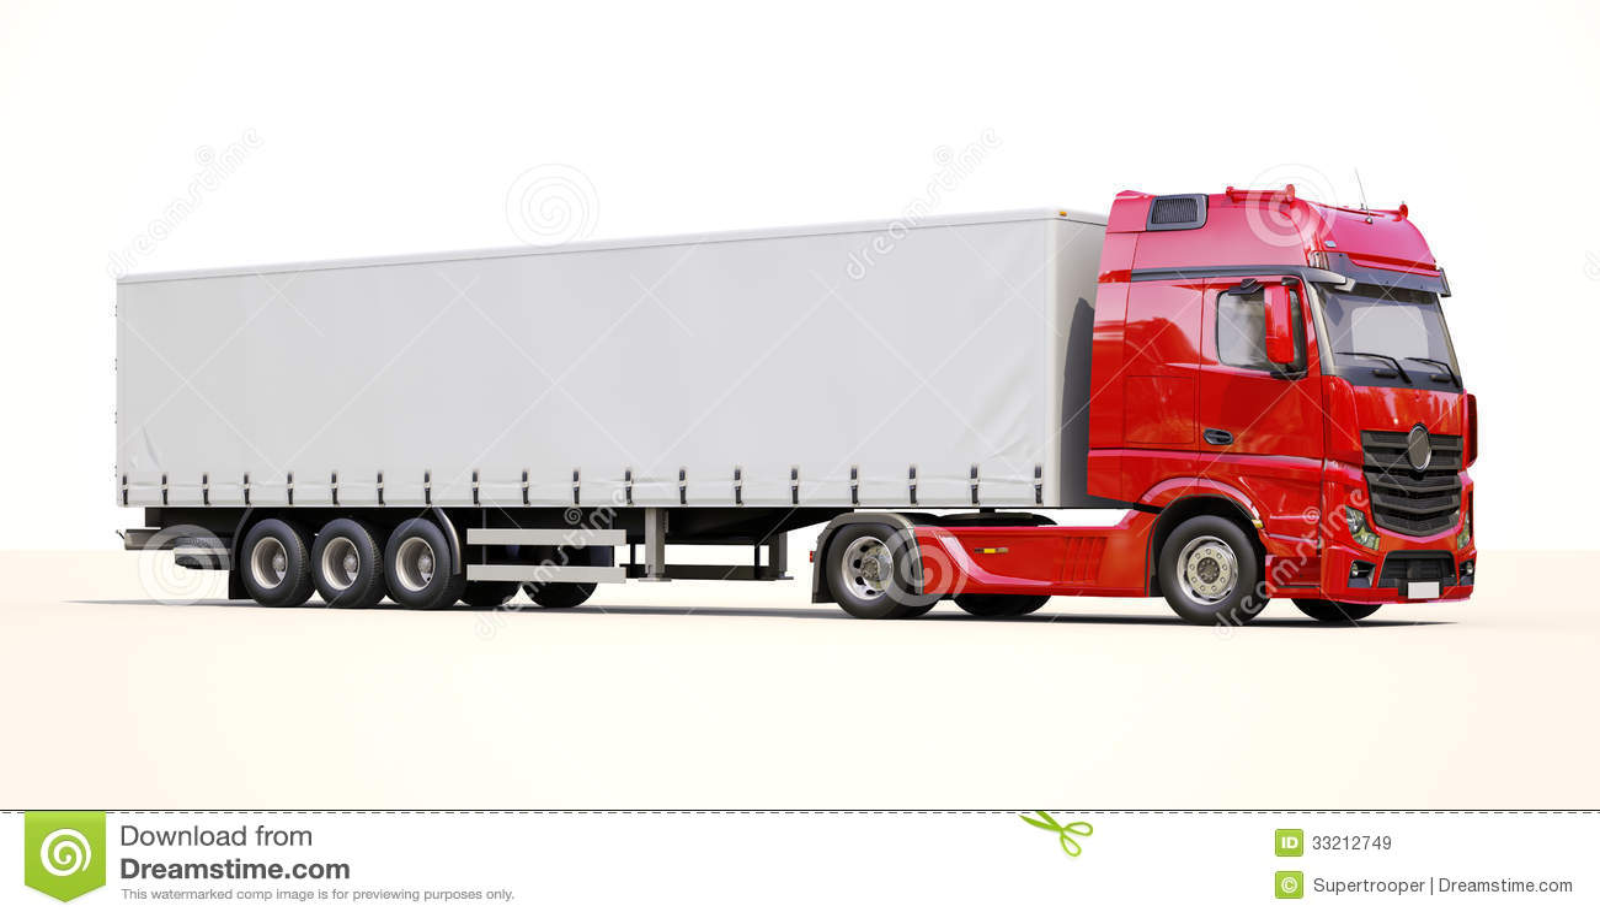 camion de semi remorque image stock image du perfection 33212749. Black Bedroom Furniture Sets. Home Design Ideas